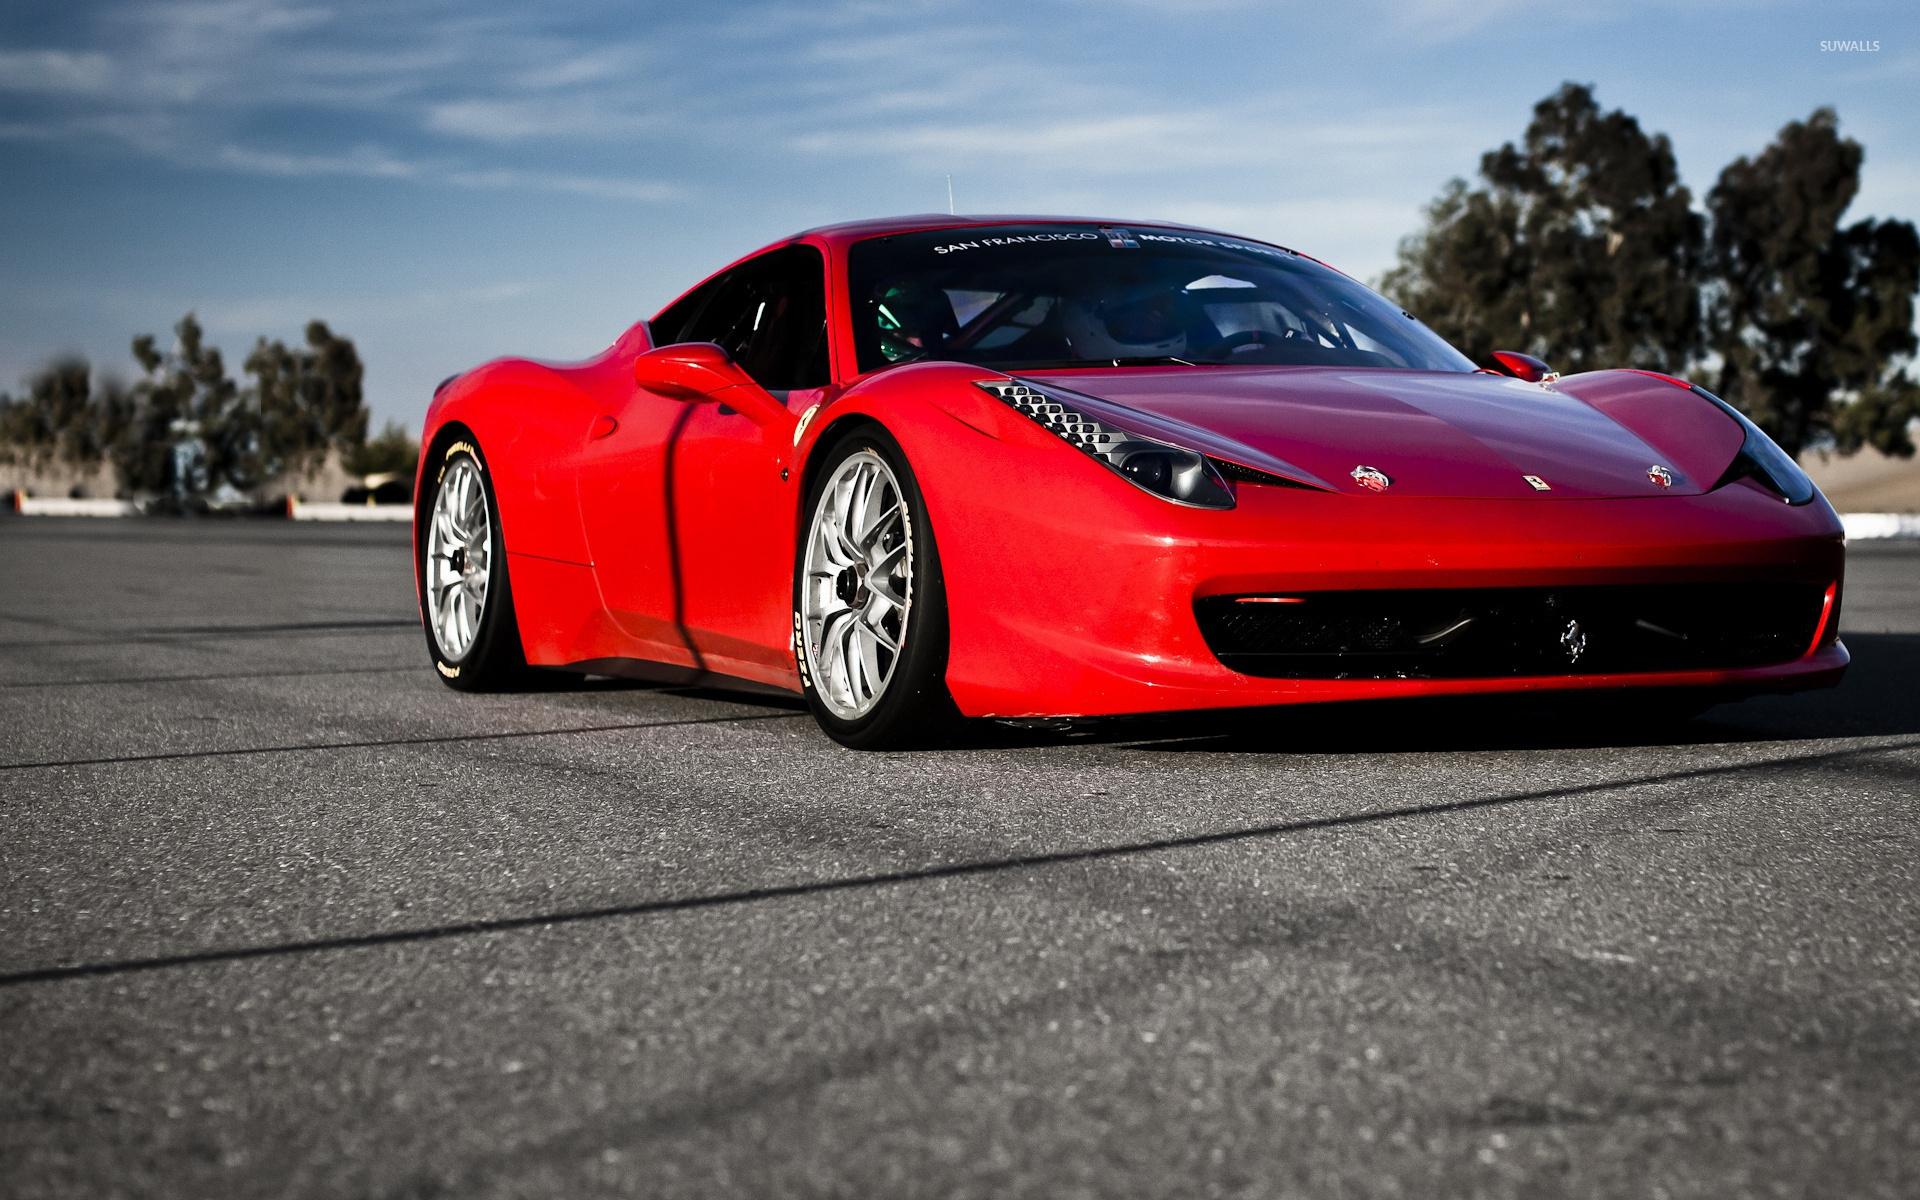 Ferrari 458 Italia Front Side View Wallpaper